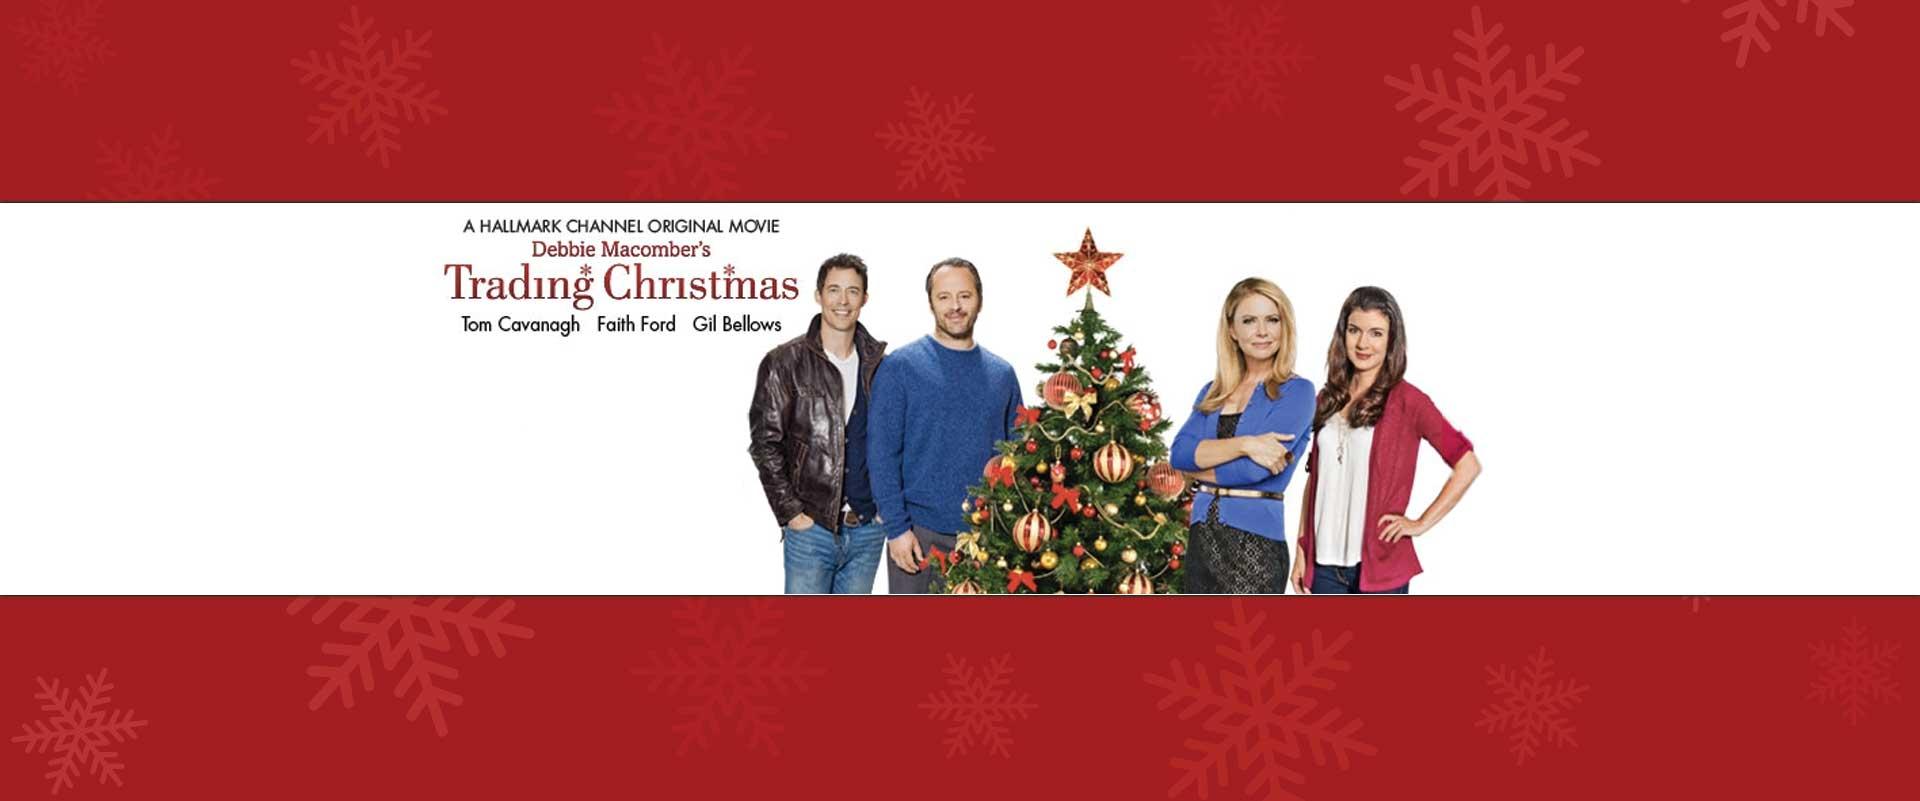 Trading Christmas — Debbie Macomber